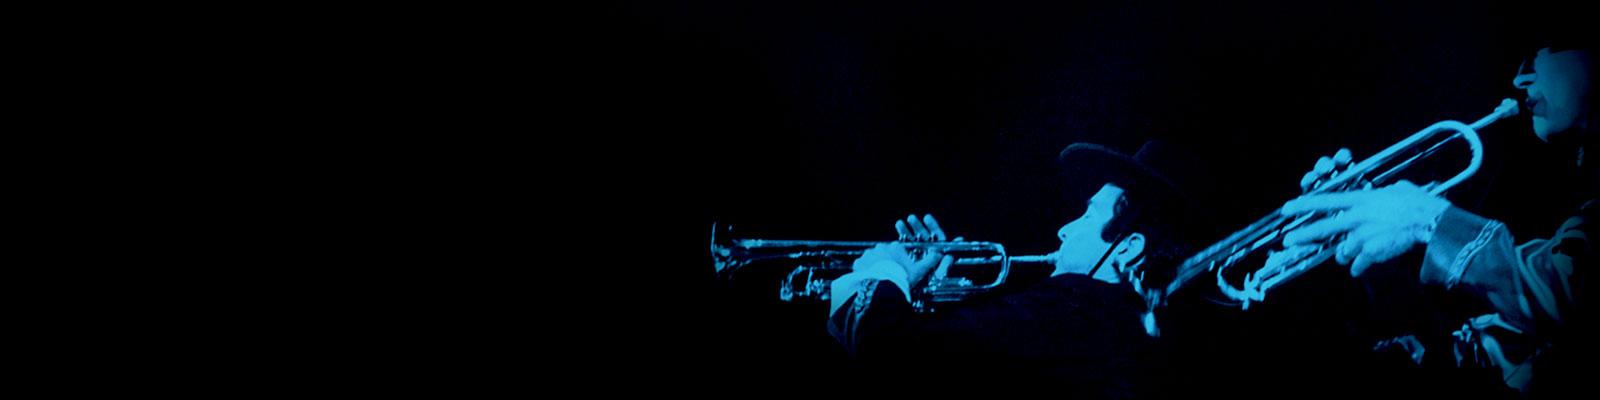 blues-jazz